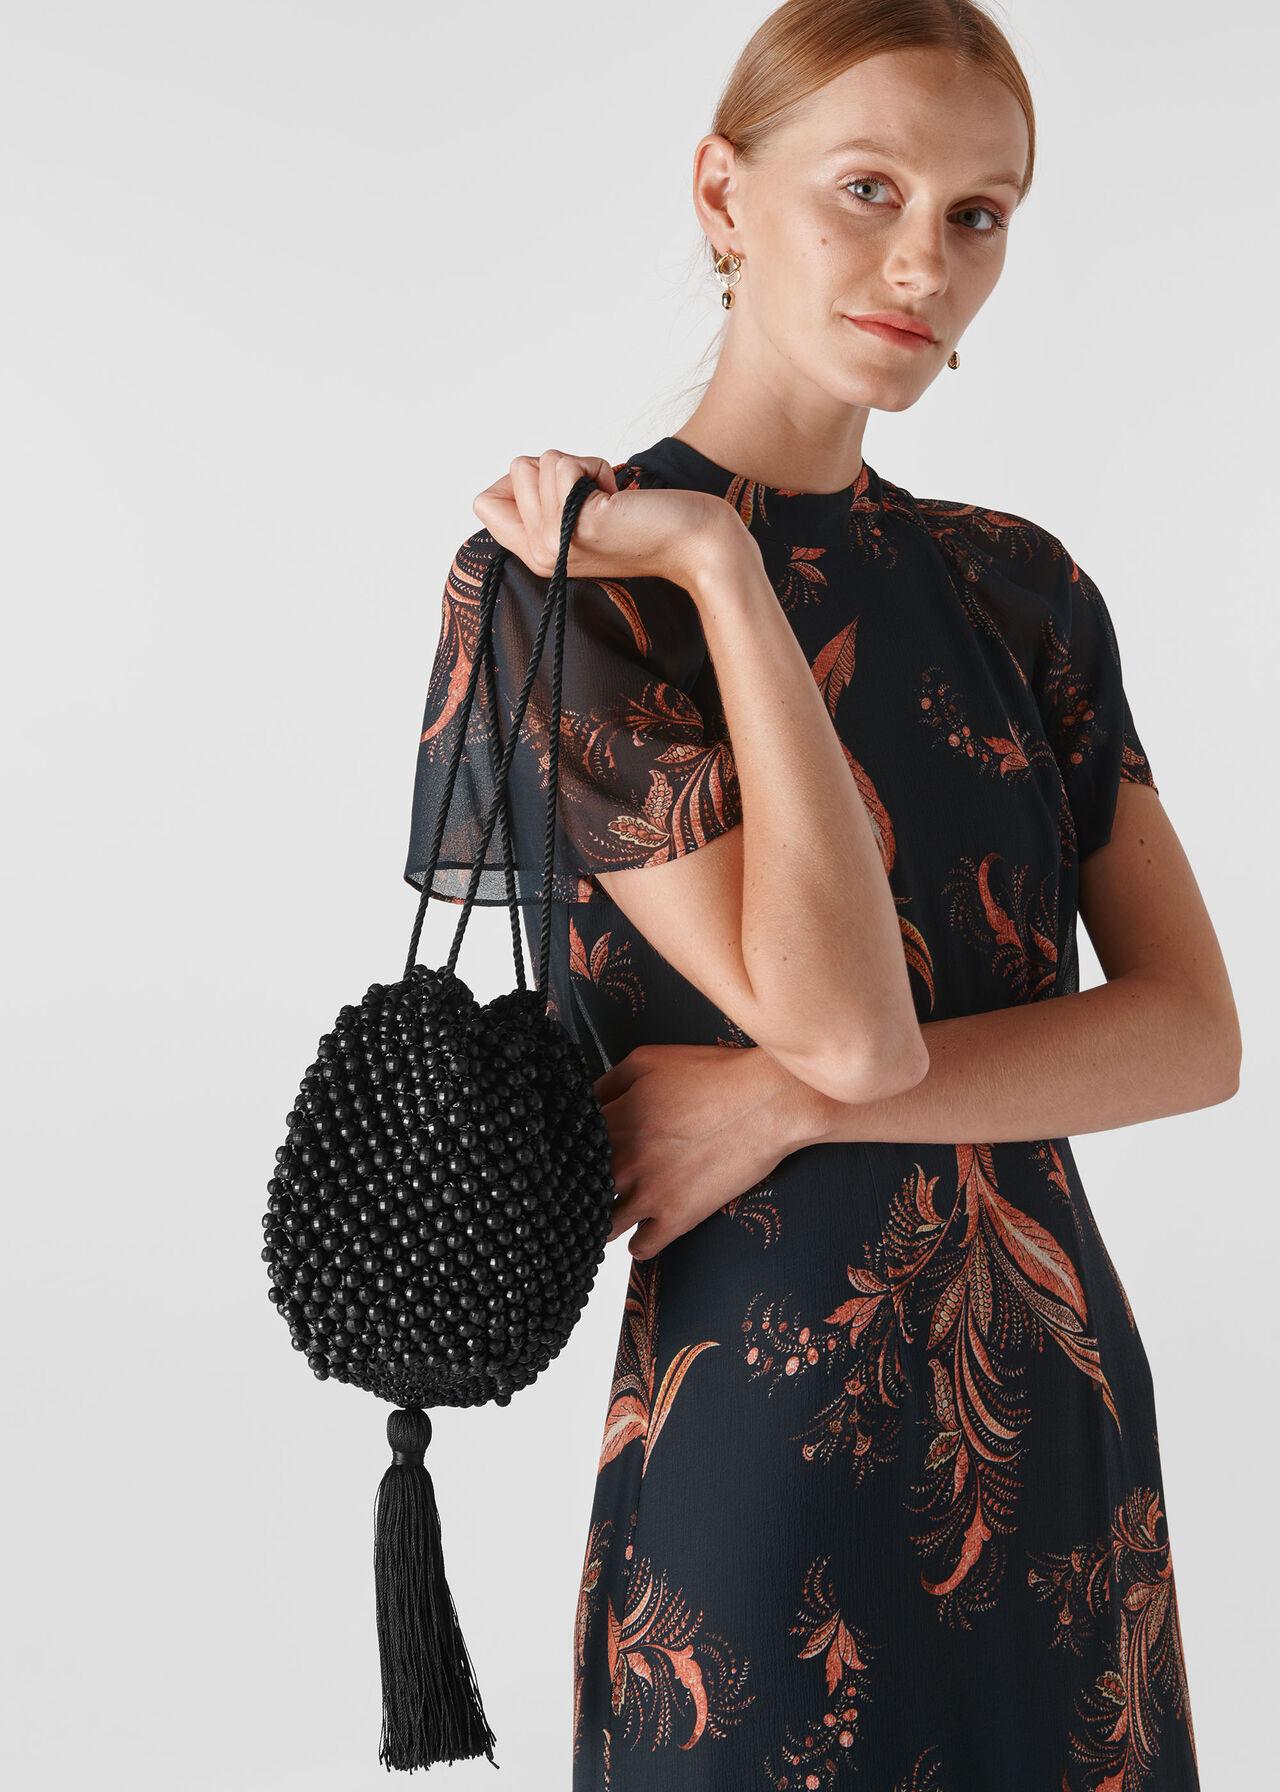 Lila Beaded Drawstring Bag Black